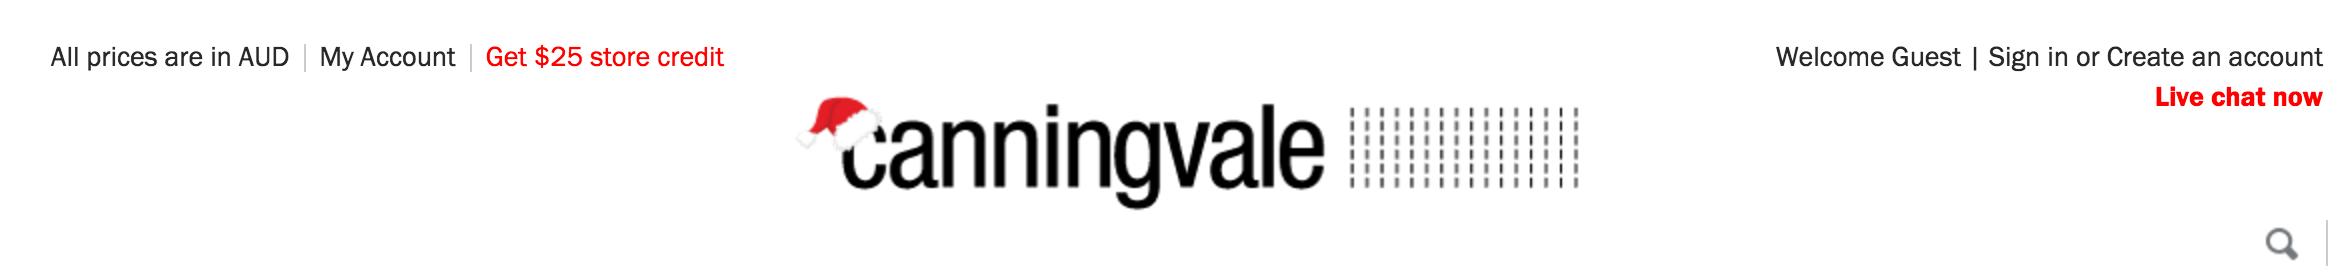 Canningvale Header